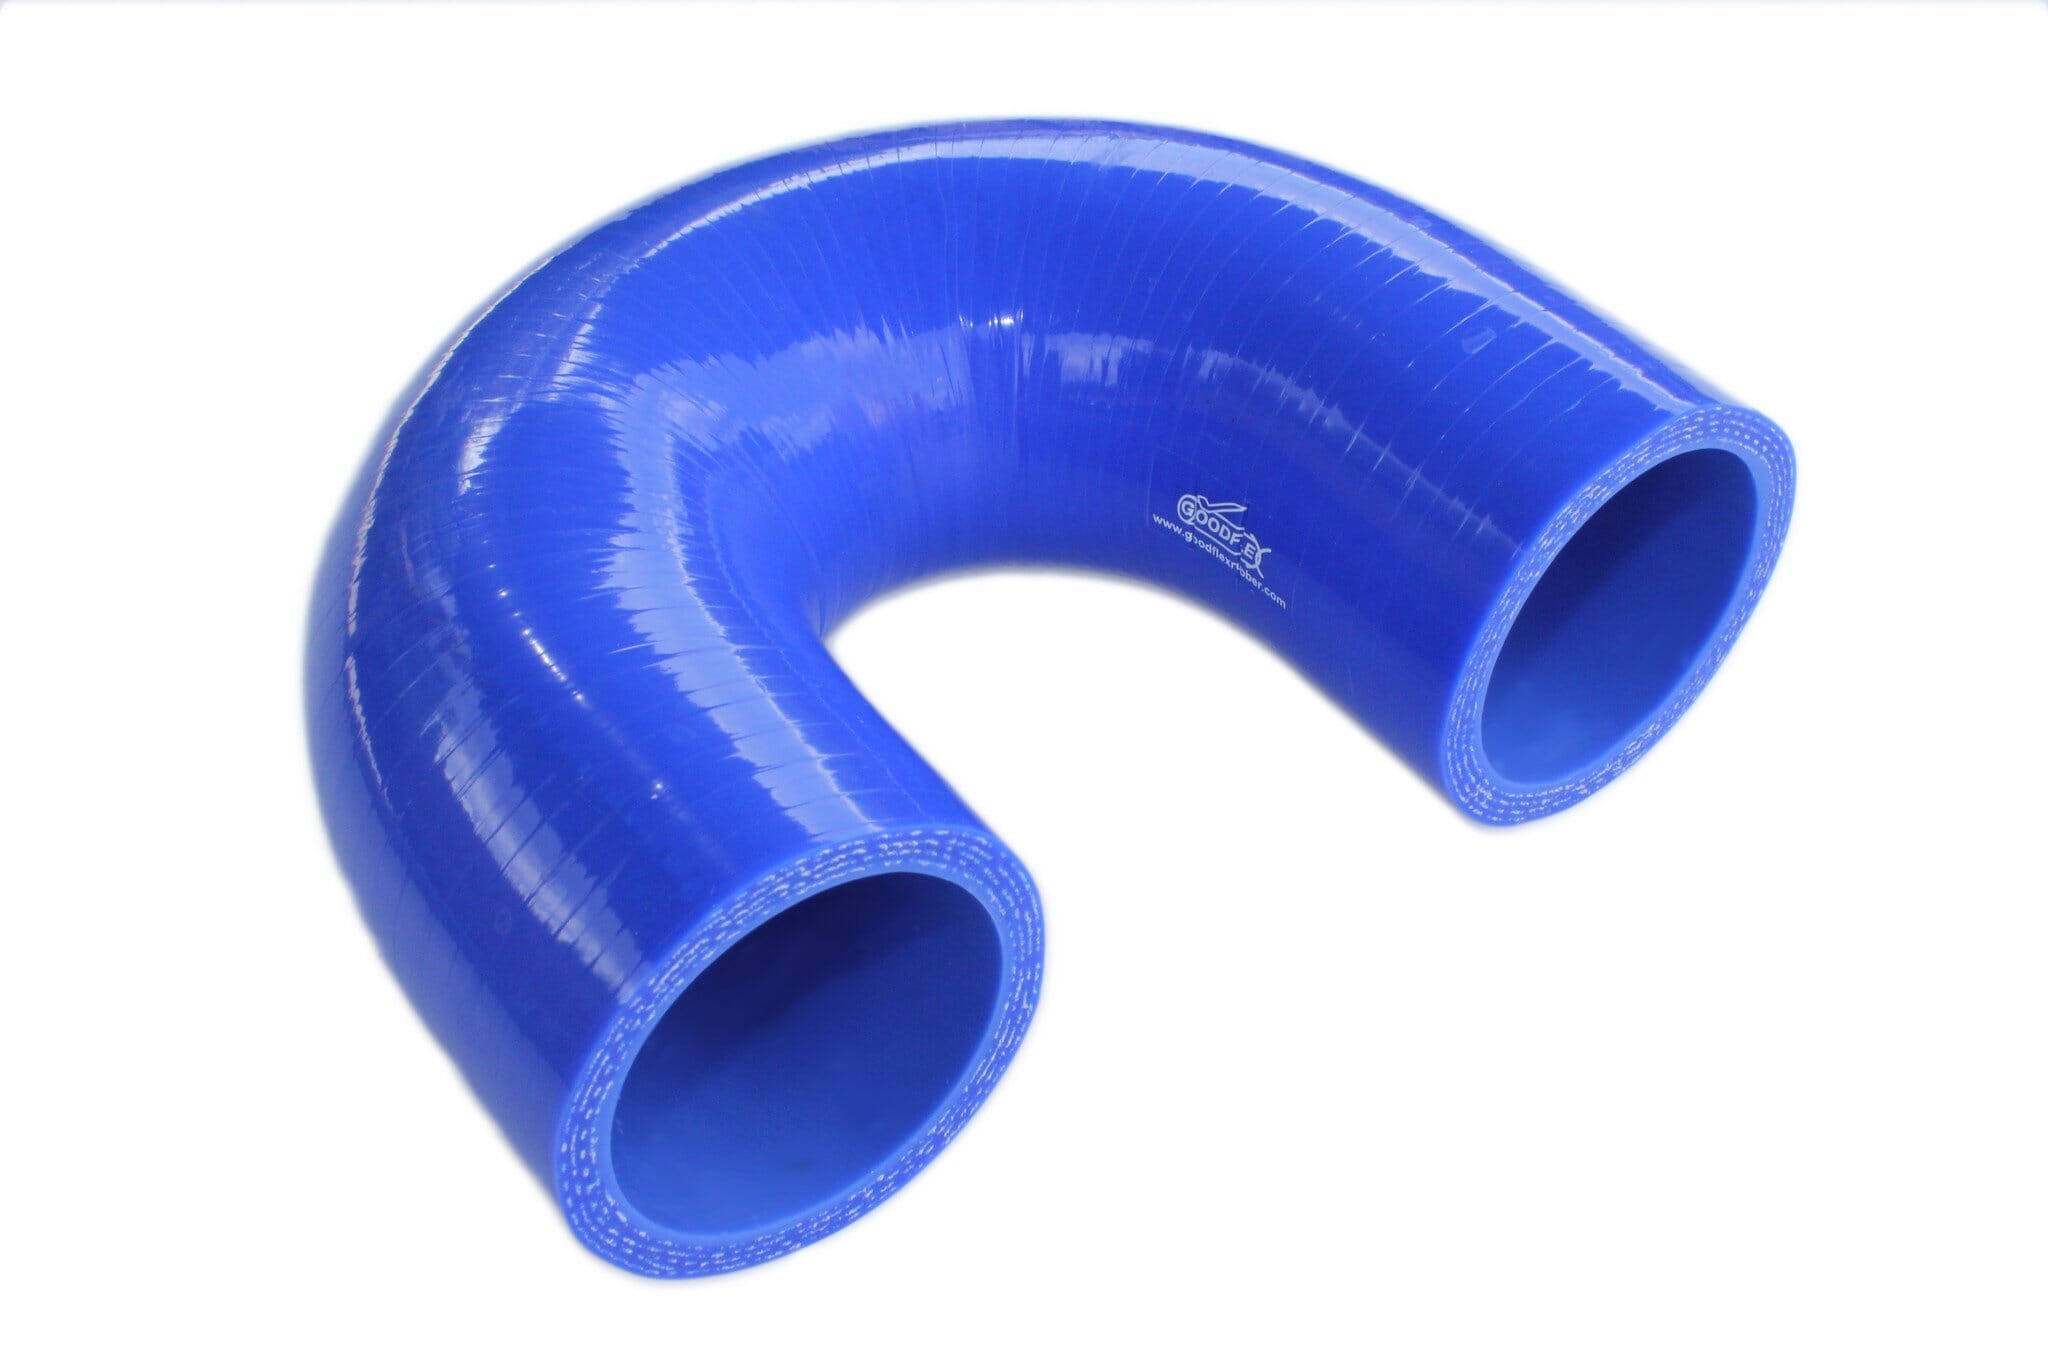 Blue_U_Bend_Lay_Down_014a33cb-7b85-4ebd-9516-08fc08d4e617